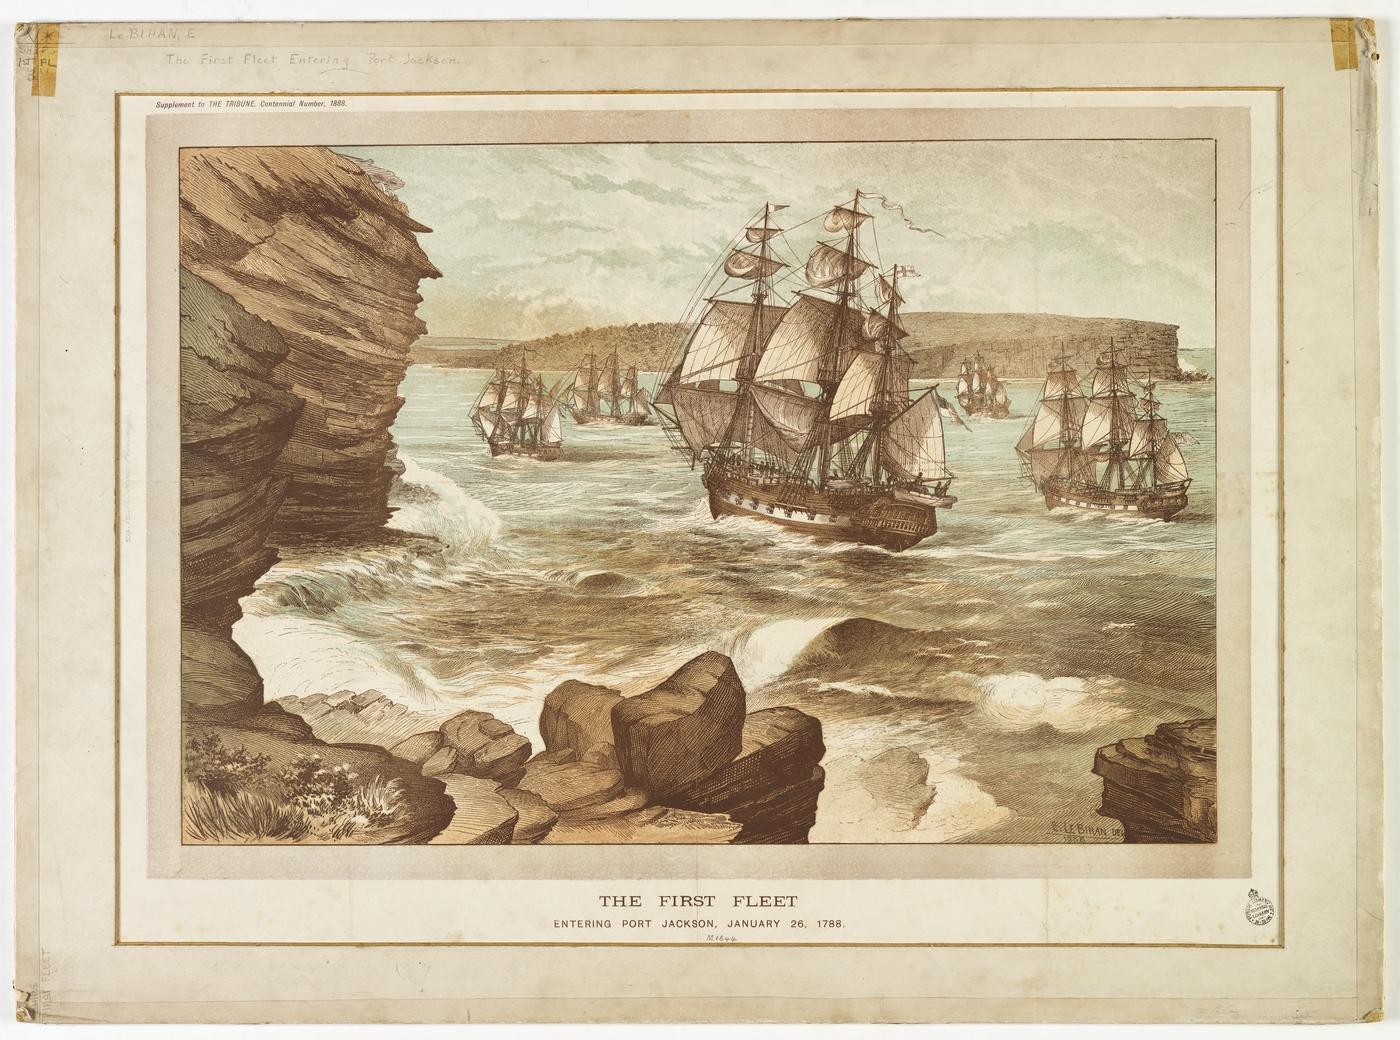 The First Fleet entering Port Jackson, January 26, 1788, drawn 1888.